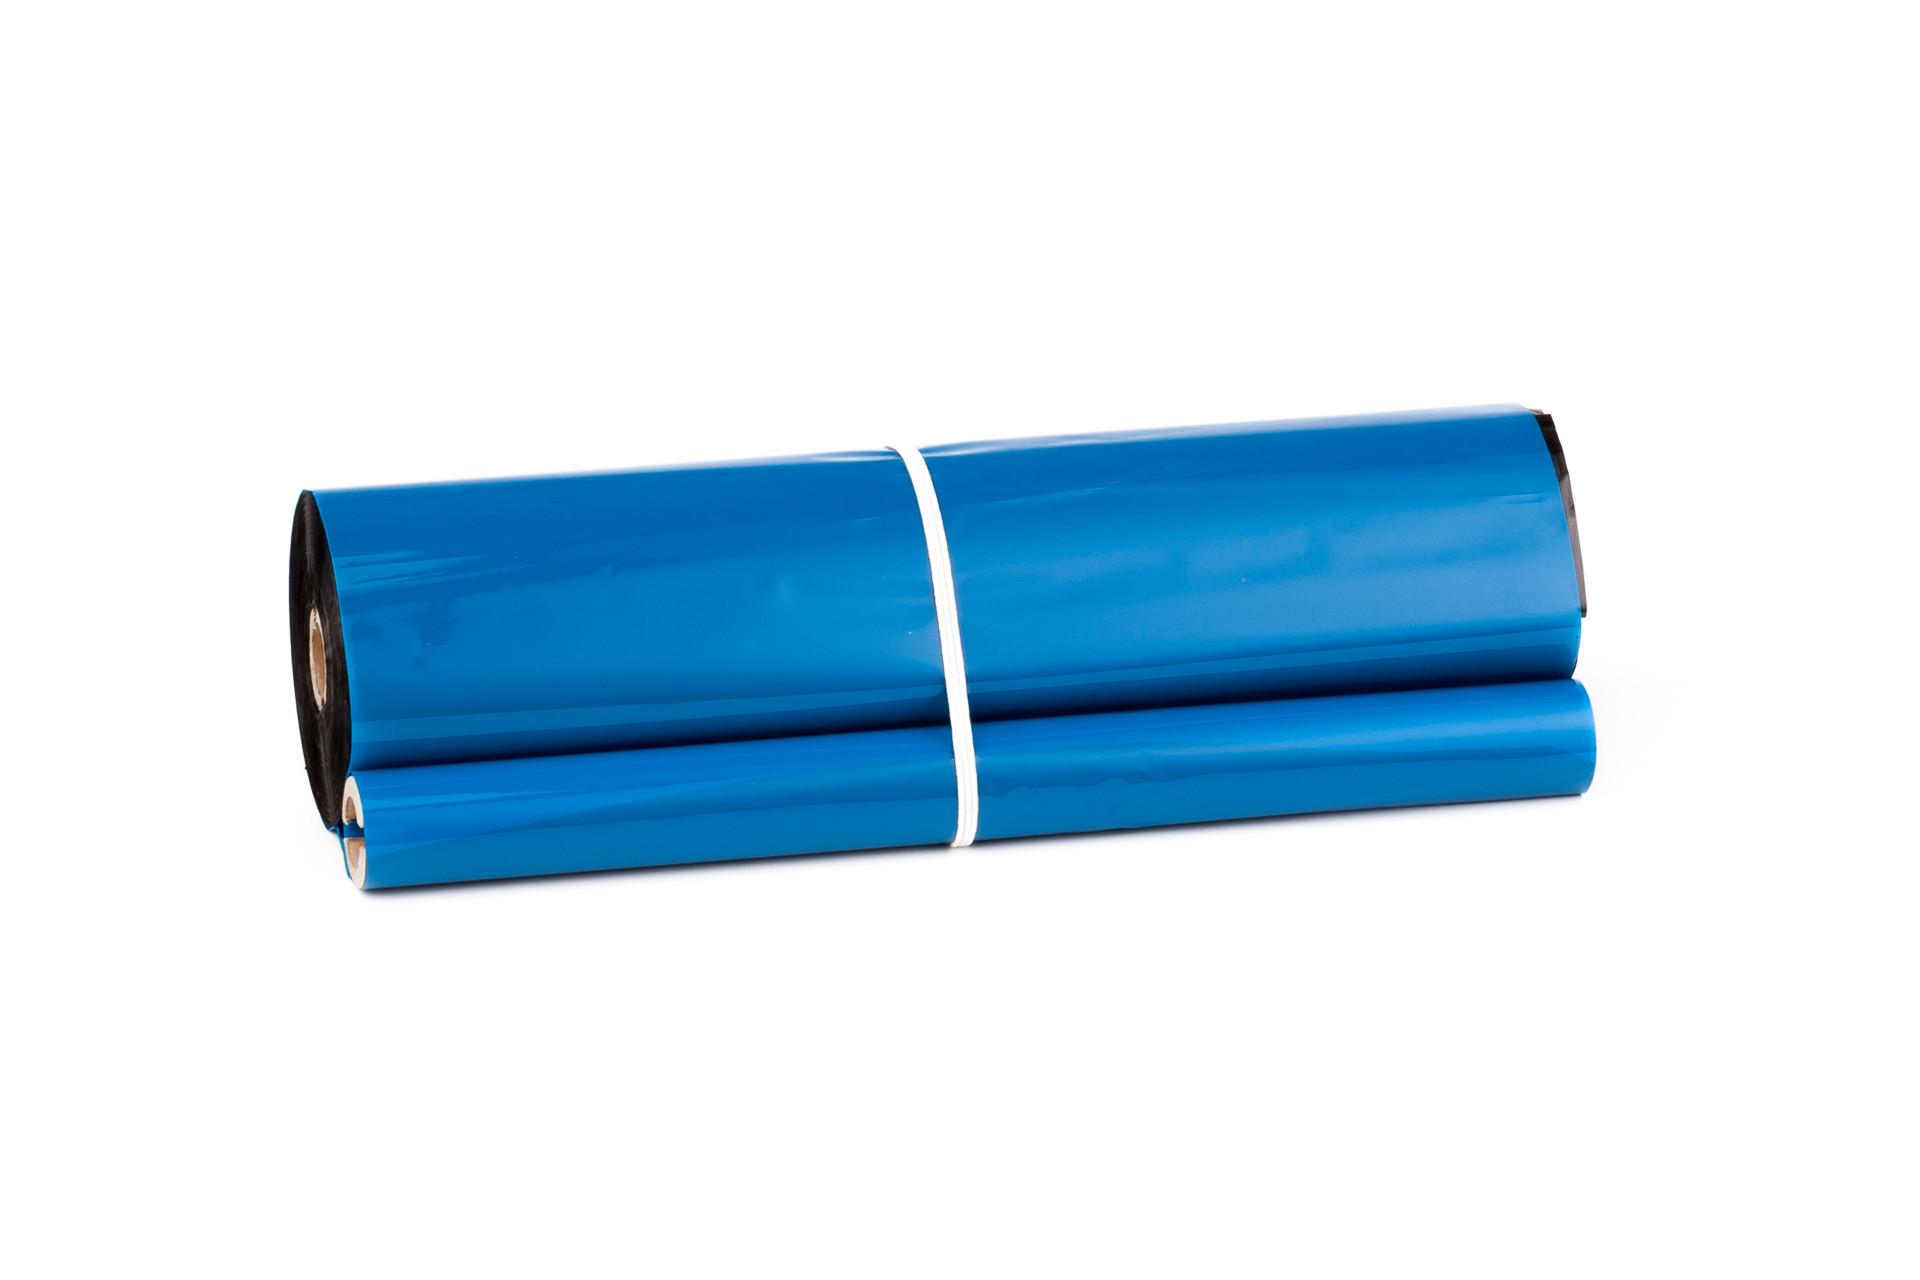 Ruban de telecopieur (alternatif) compatible à Brother PC 102 RF / Twinpack / Brother FAX 1150 P / 1200 P / 1700 P / Intellifax 1150 / 1200 / 1250 / 1350 / 1450 / 1550 / 1700 etc.